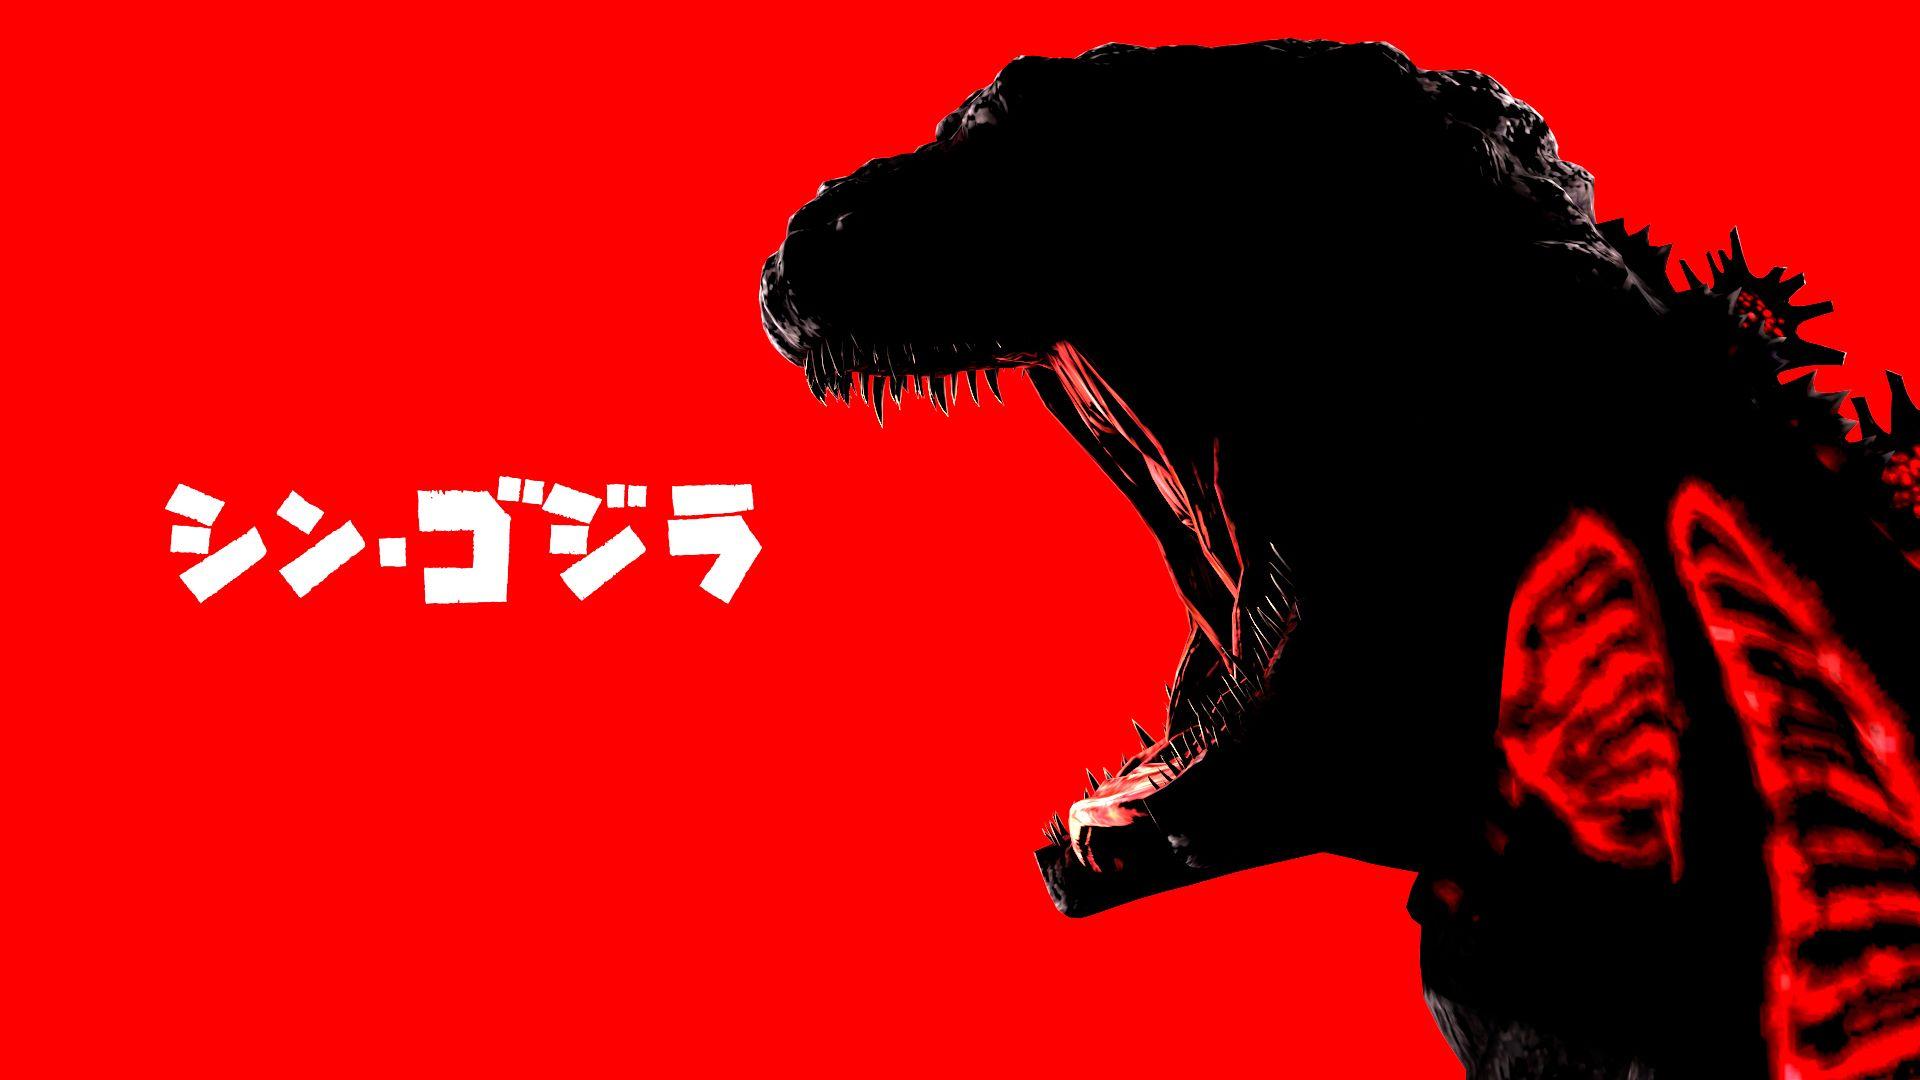 Shin Godzilla Silhouette [1920x1080] Active wallpaper Desktop 1920x1080